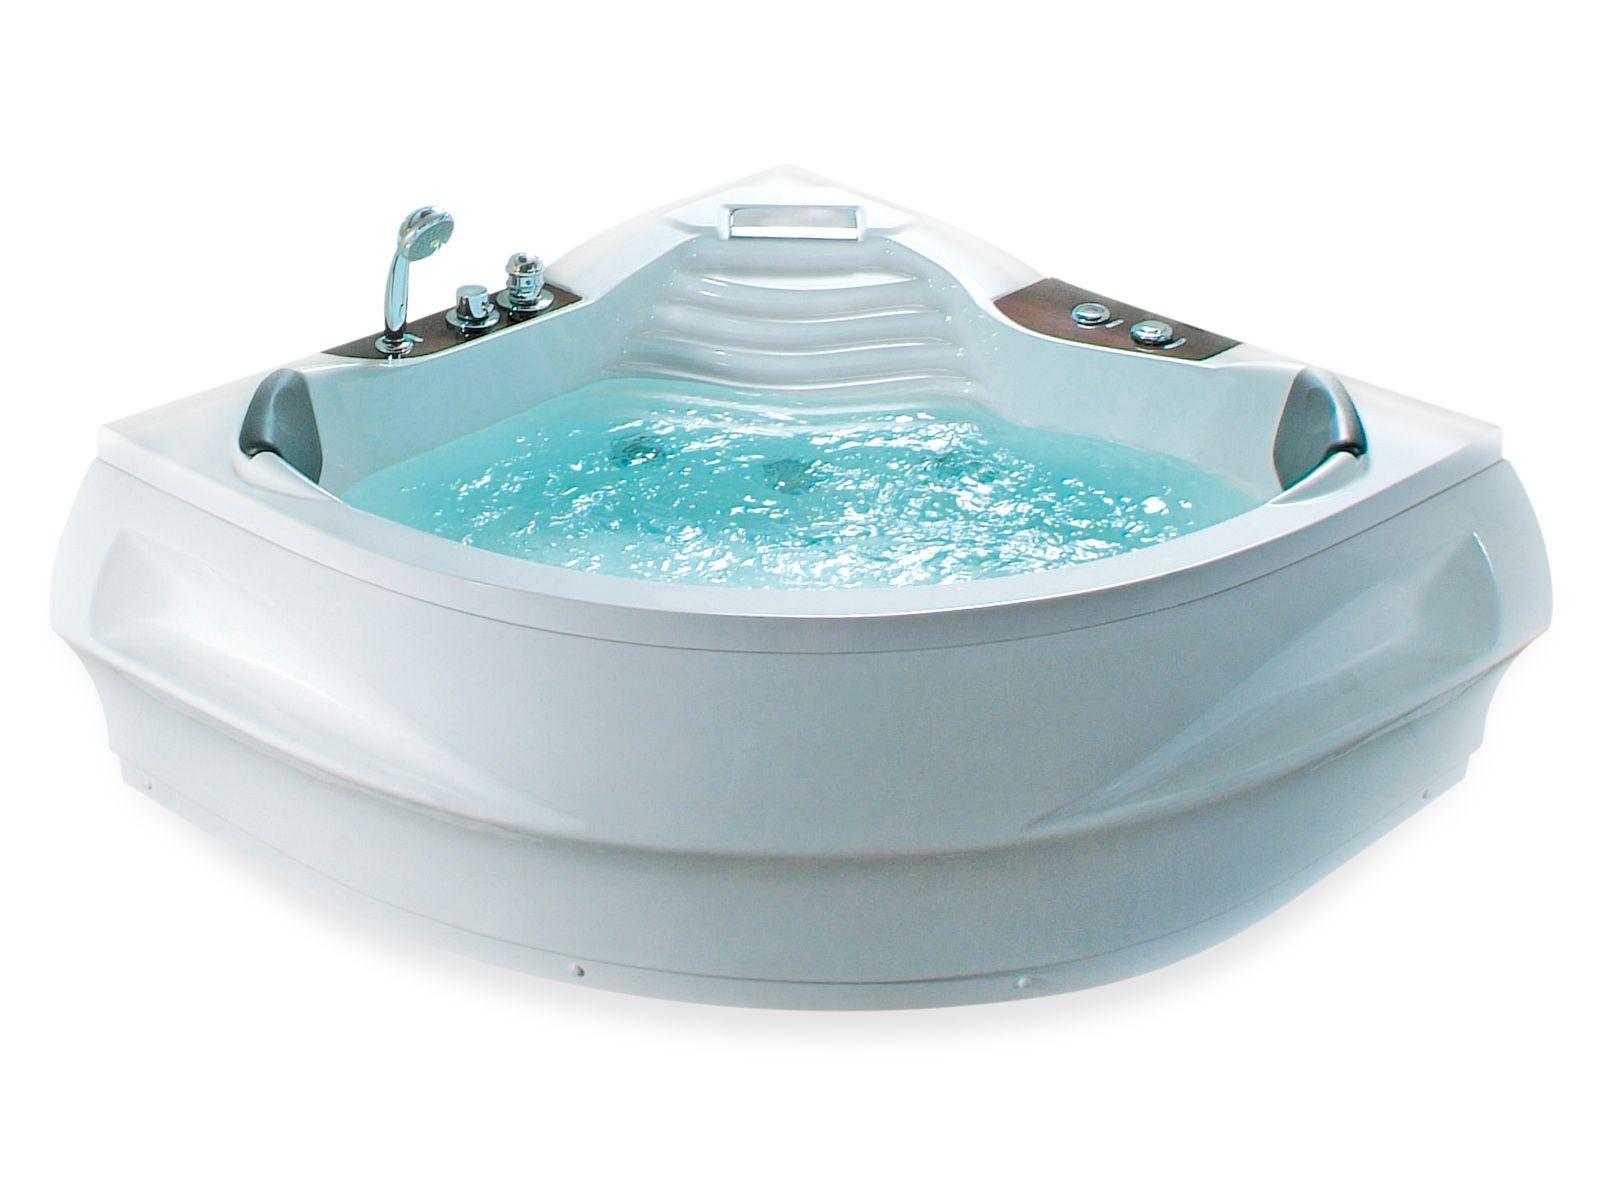 Whirlpool-Badewanne Eckmodell MONACO | Jacuzzi, Monaco and House